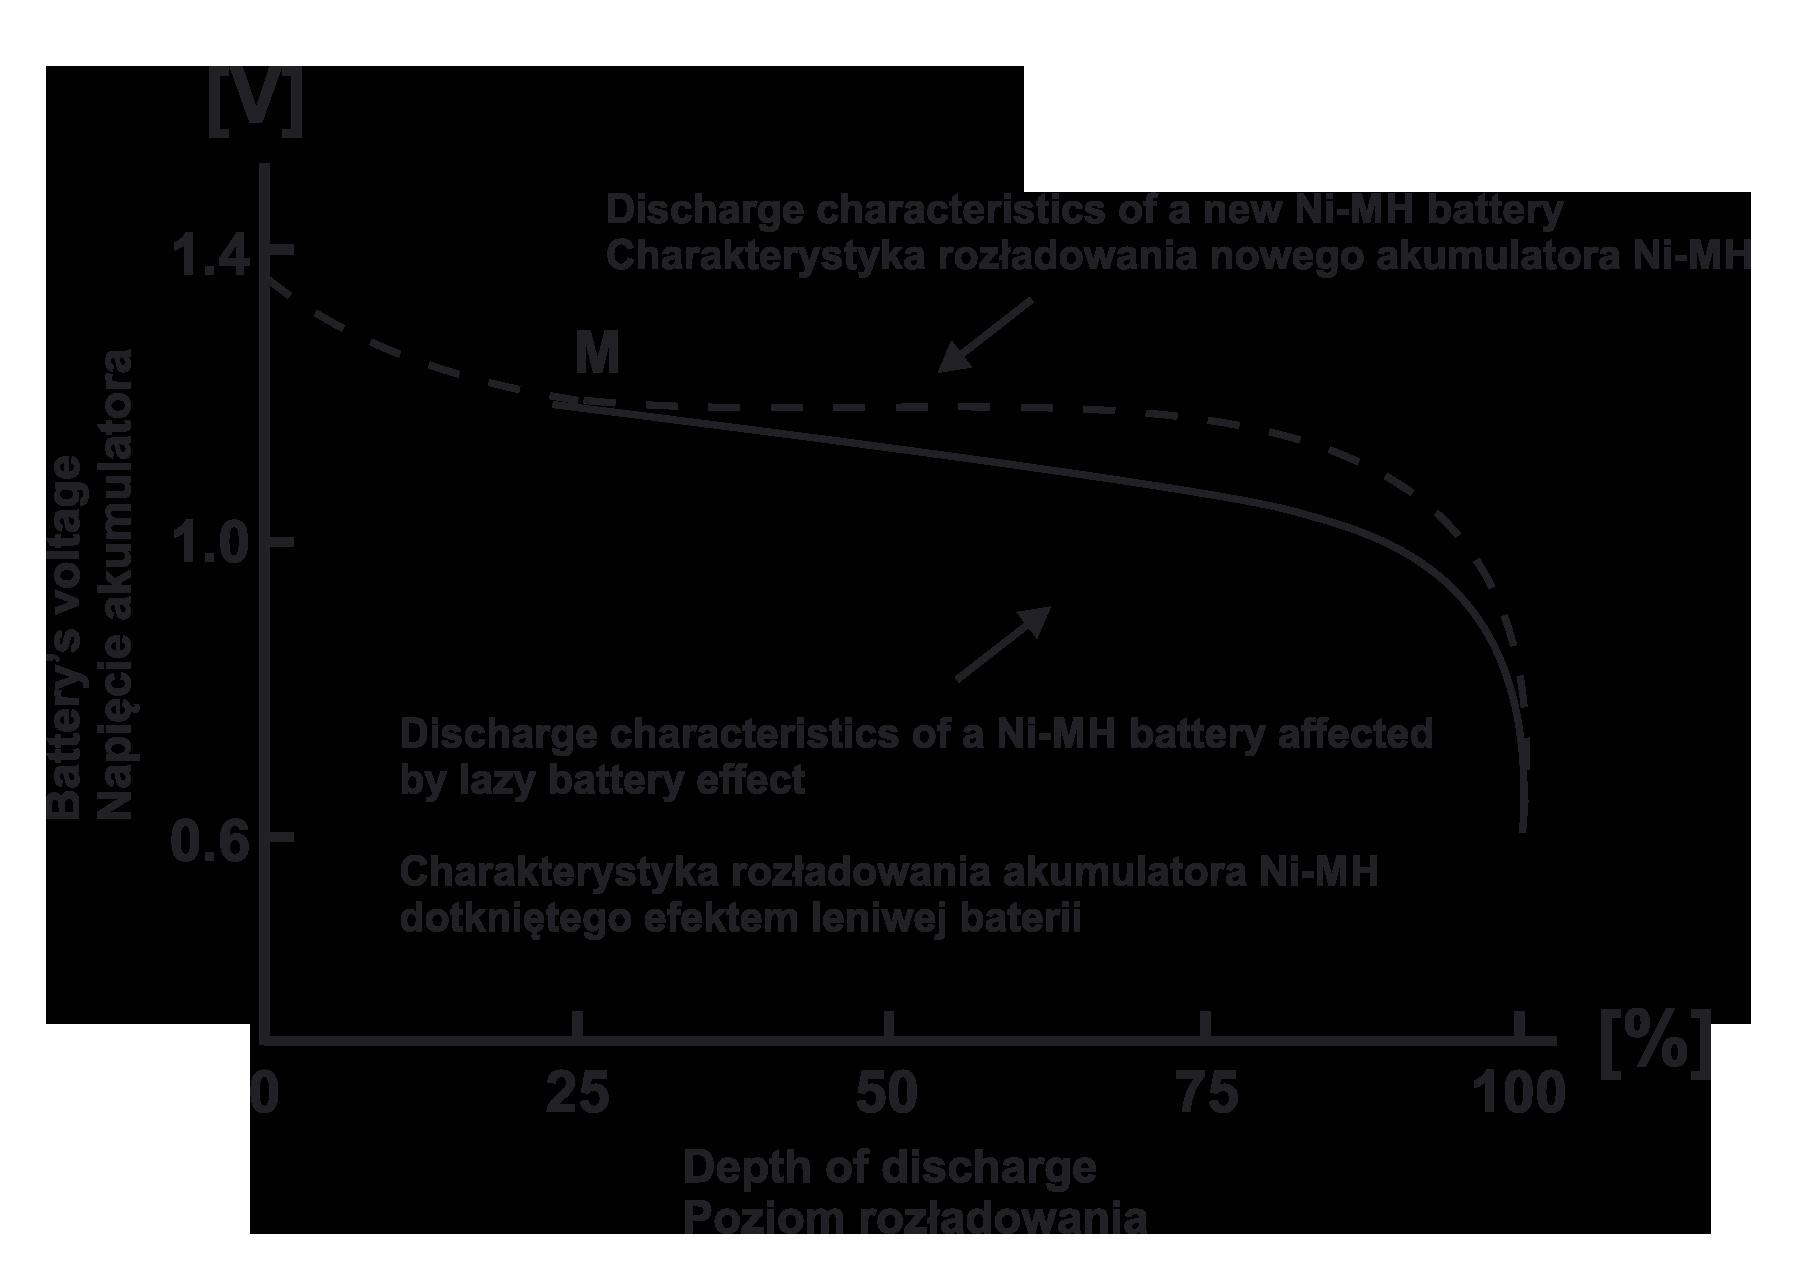 Efekt leniwej baterii w akumulatorach Ni-MH